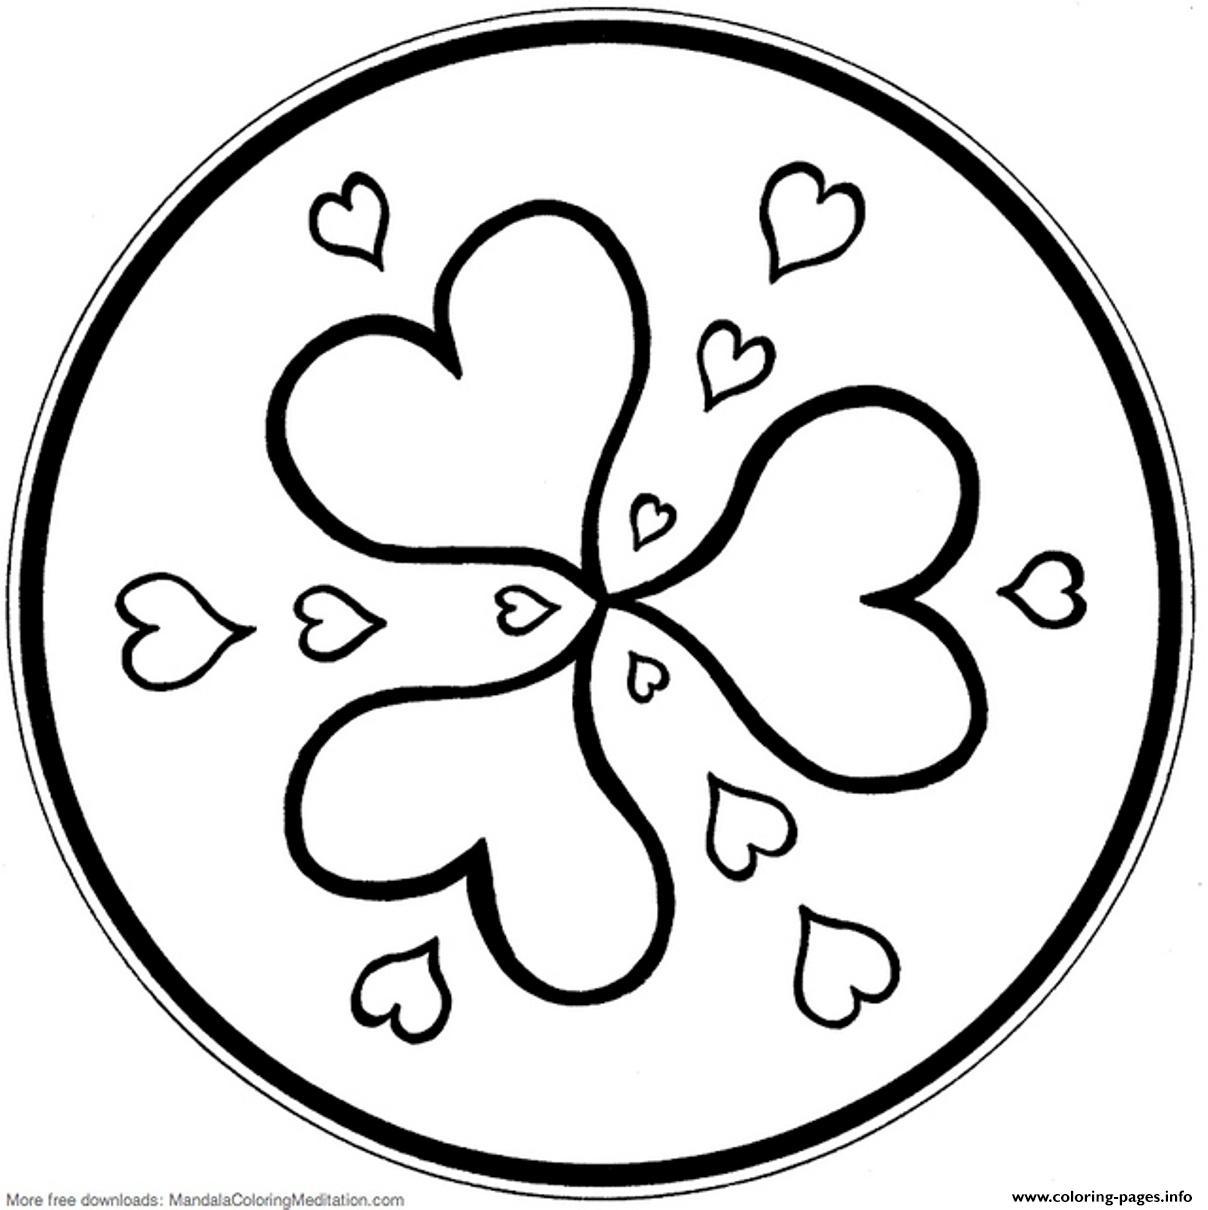 Coloring pages of hearts - Coloring Pages Of Hearts 72